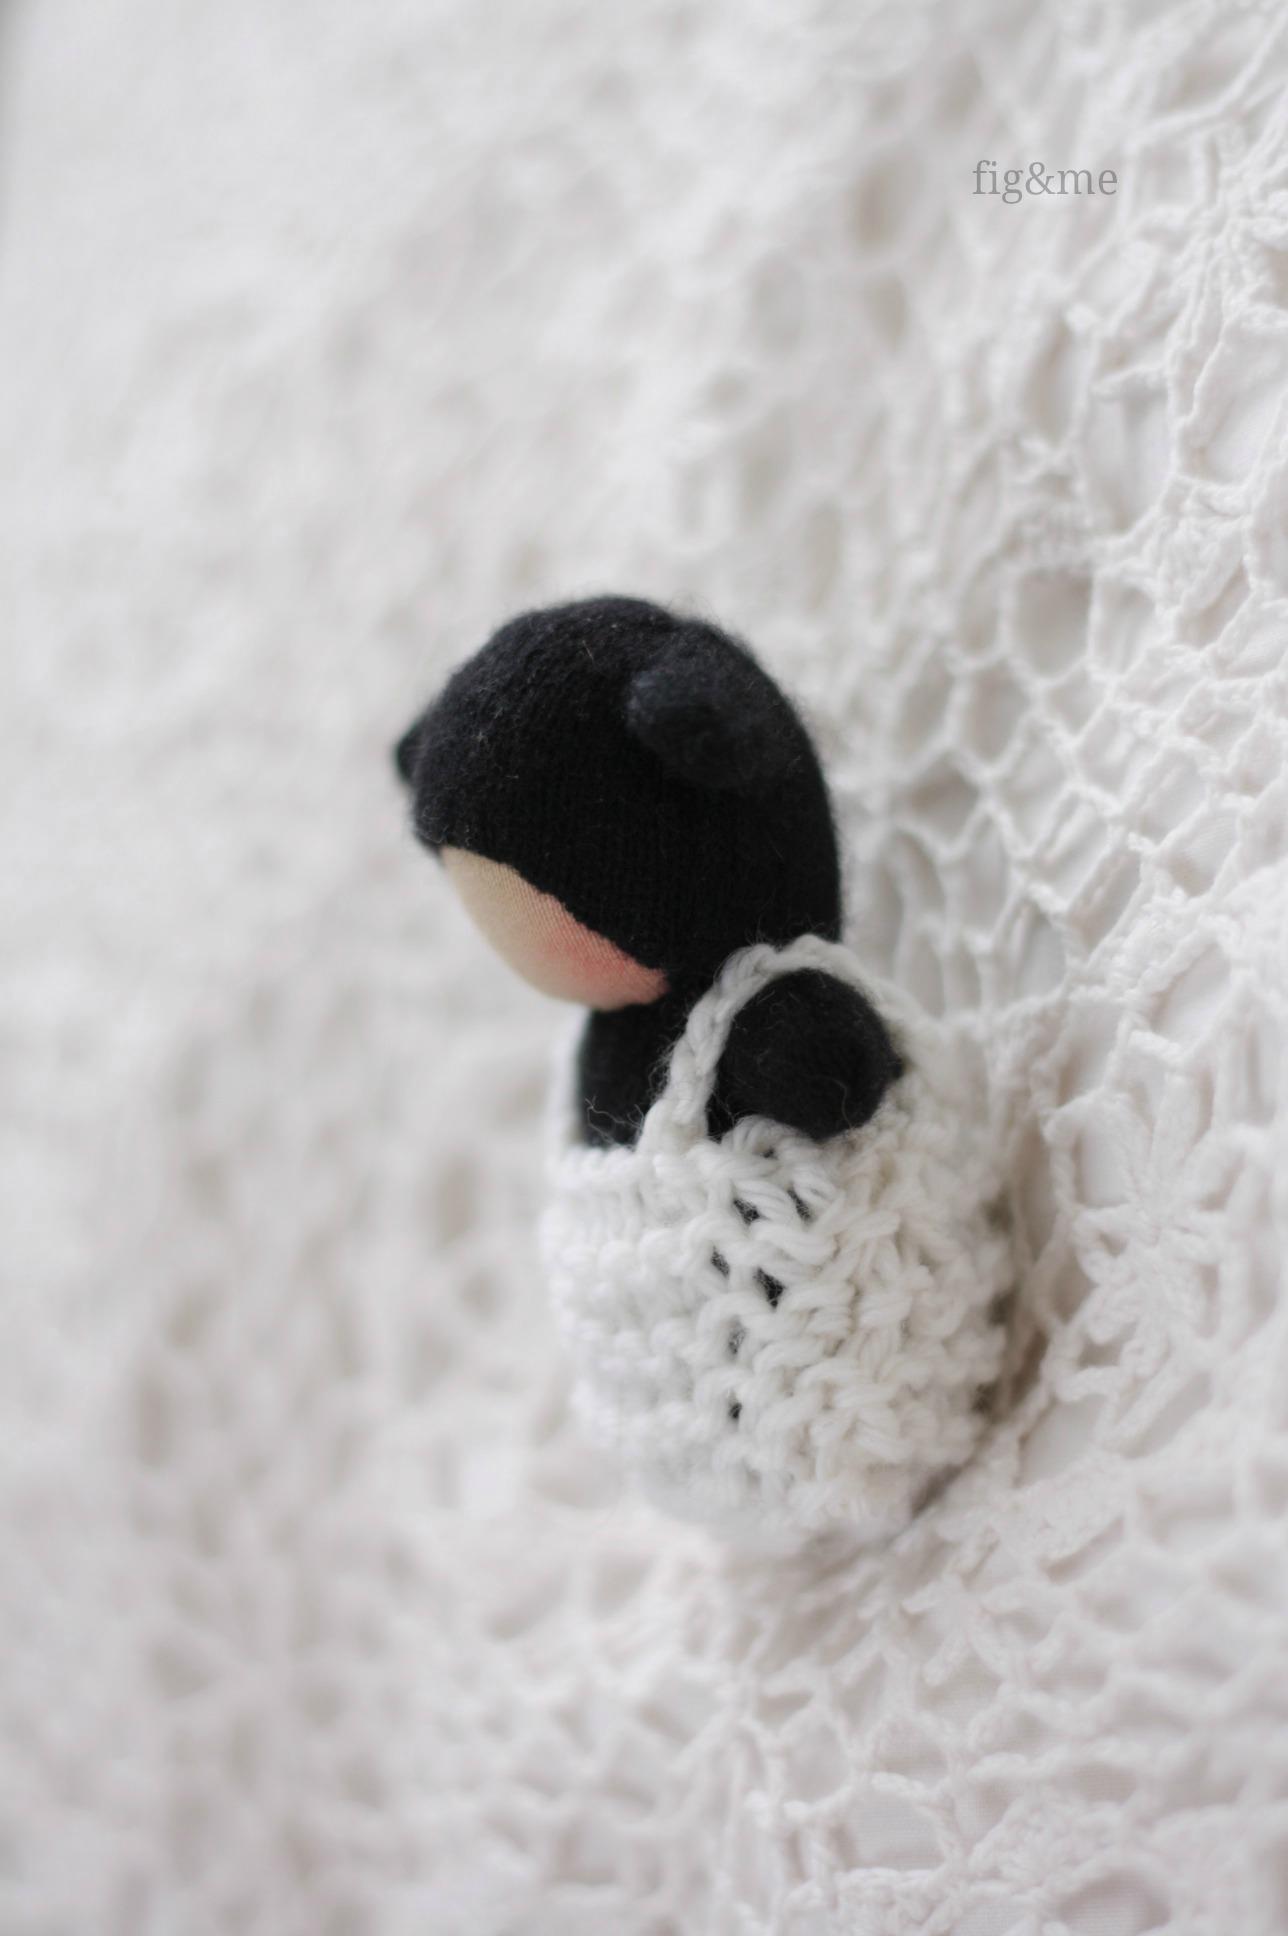 Little Black Lamb, by Fig&me